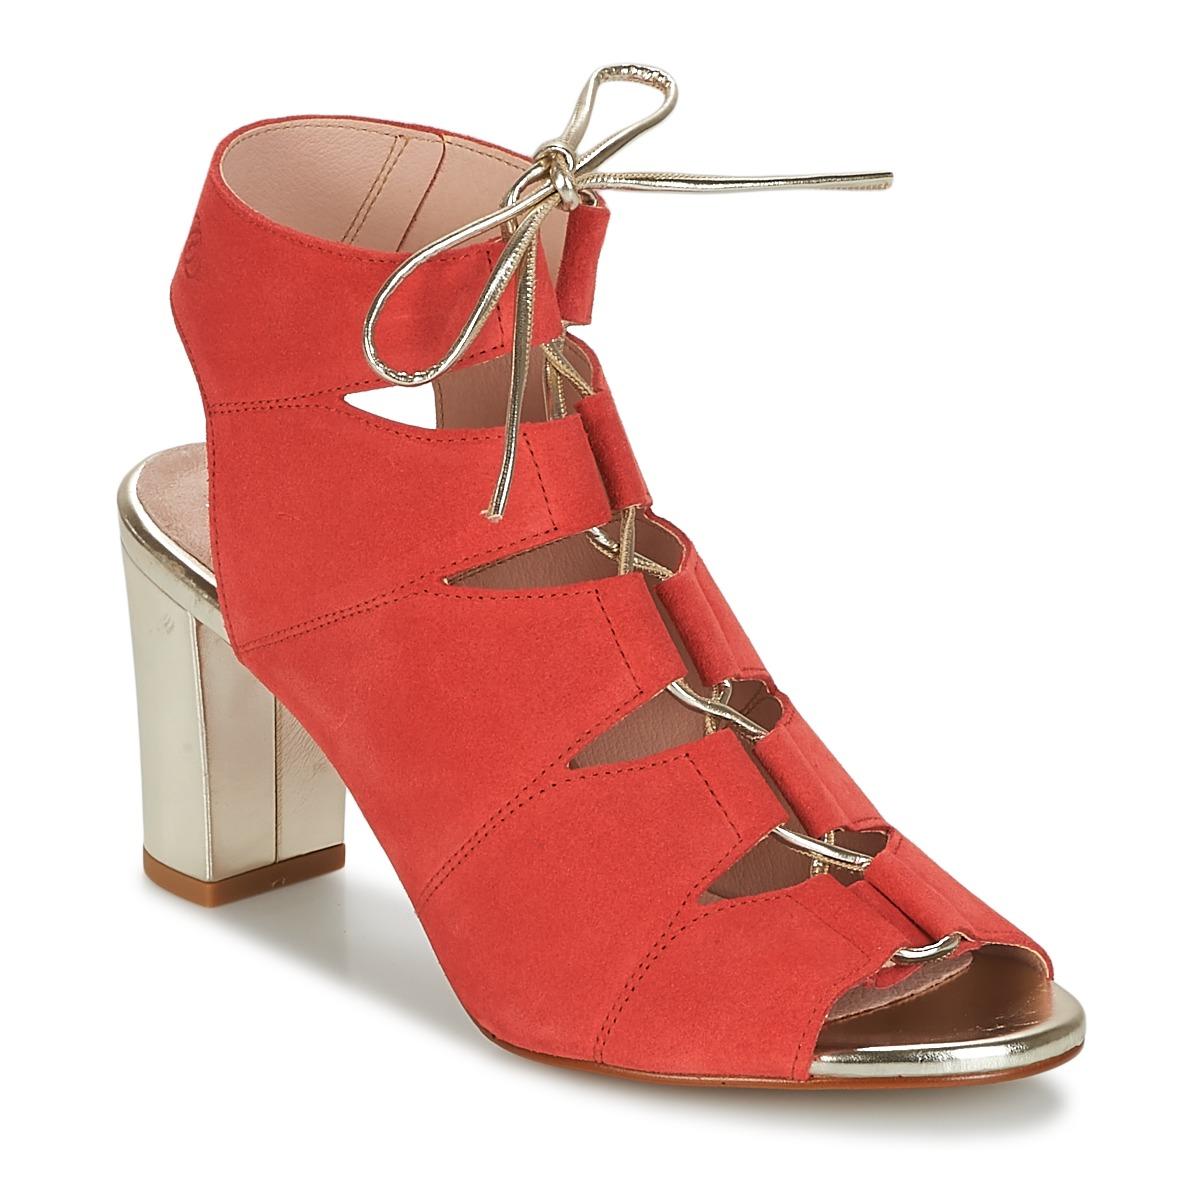 Betty London INALU Rot - Kostenloser Versand bei Spartoode ! - Schuhe Sandalen / Sandaletten Damen 47,99 €